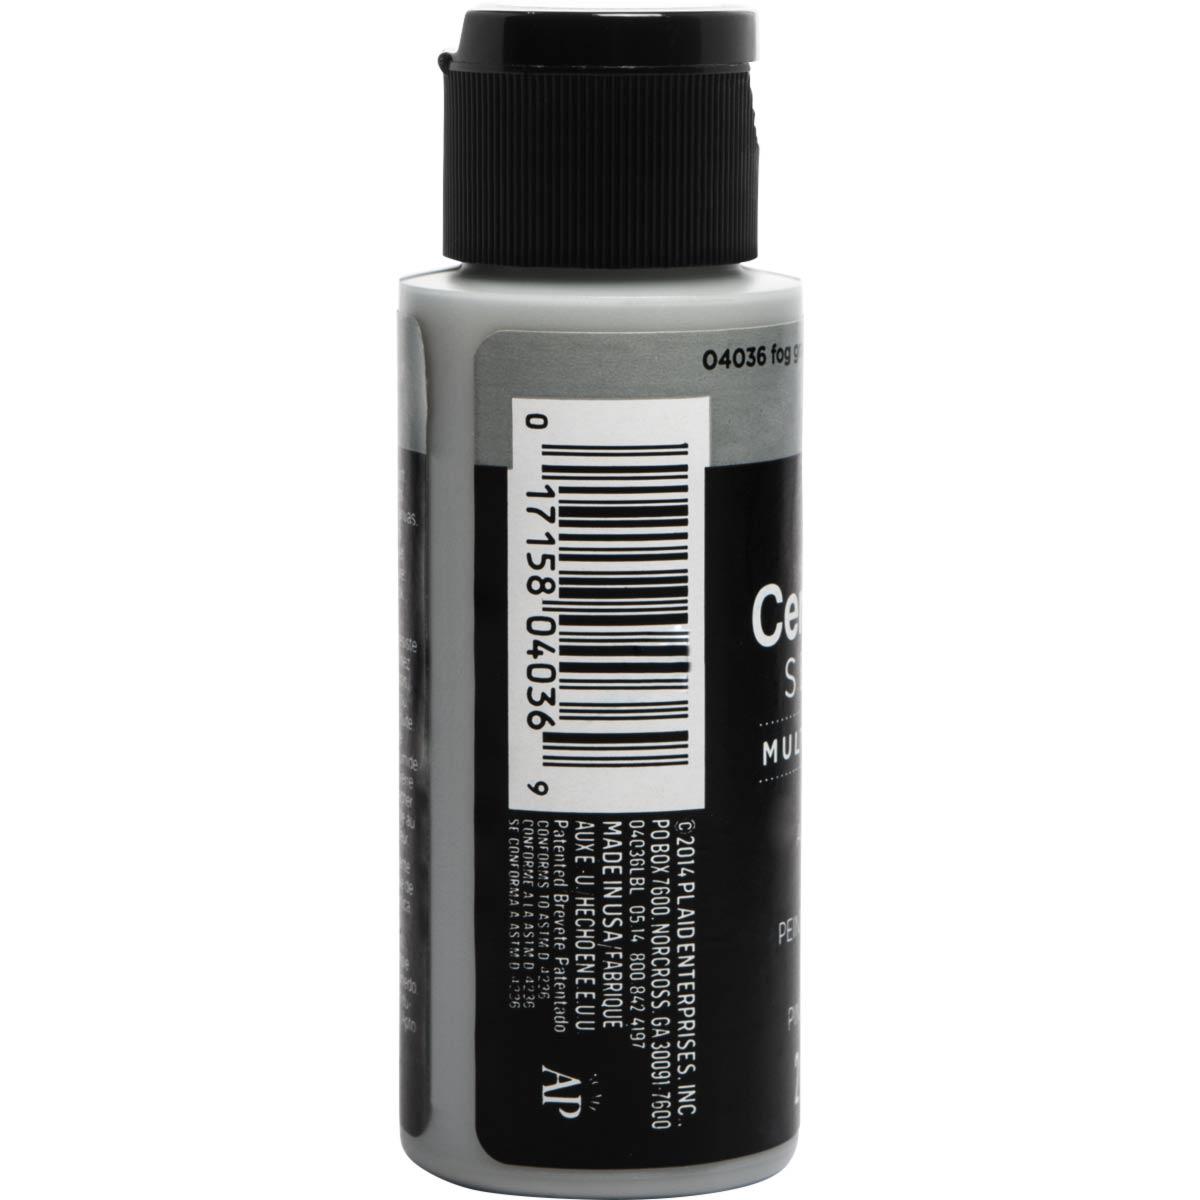 Delta Ceramcoat ® Select Multi-Surface Acrylic Paint - Satin - Fog Gray, 2 oz. - 04036